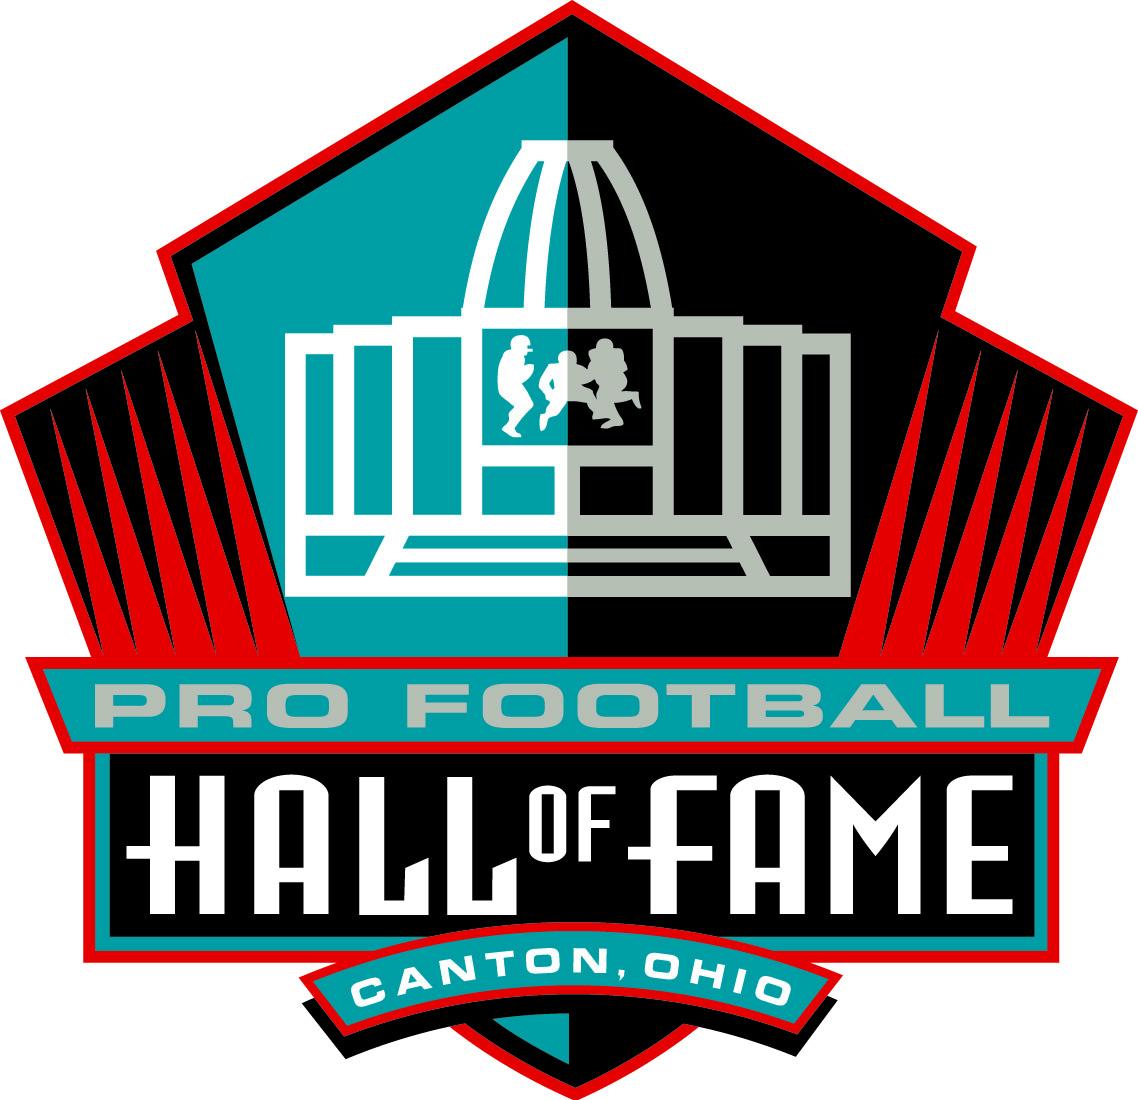 Hall of Fame 4cl.jpg